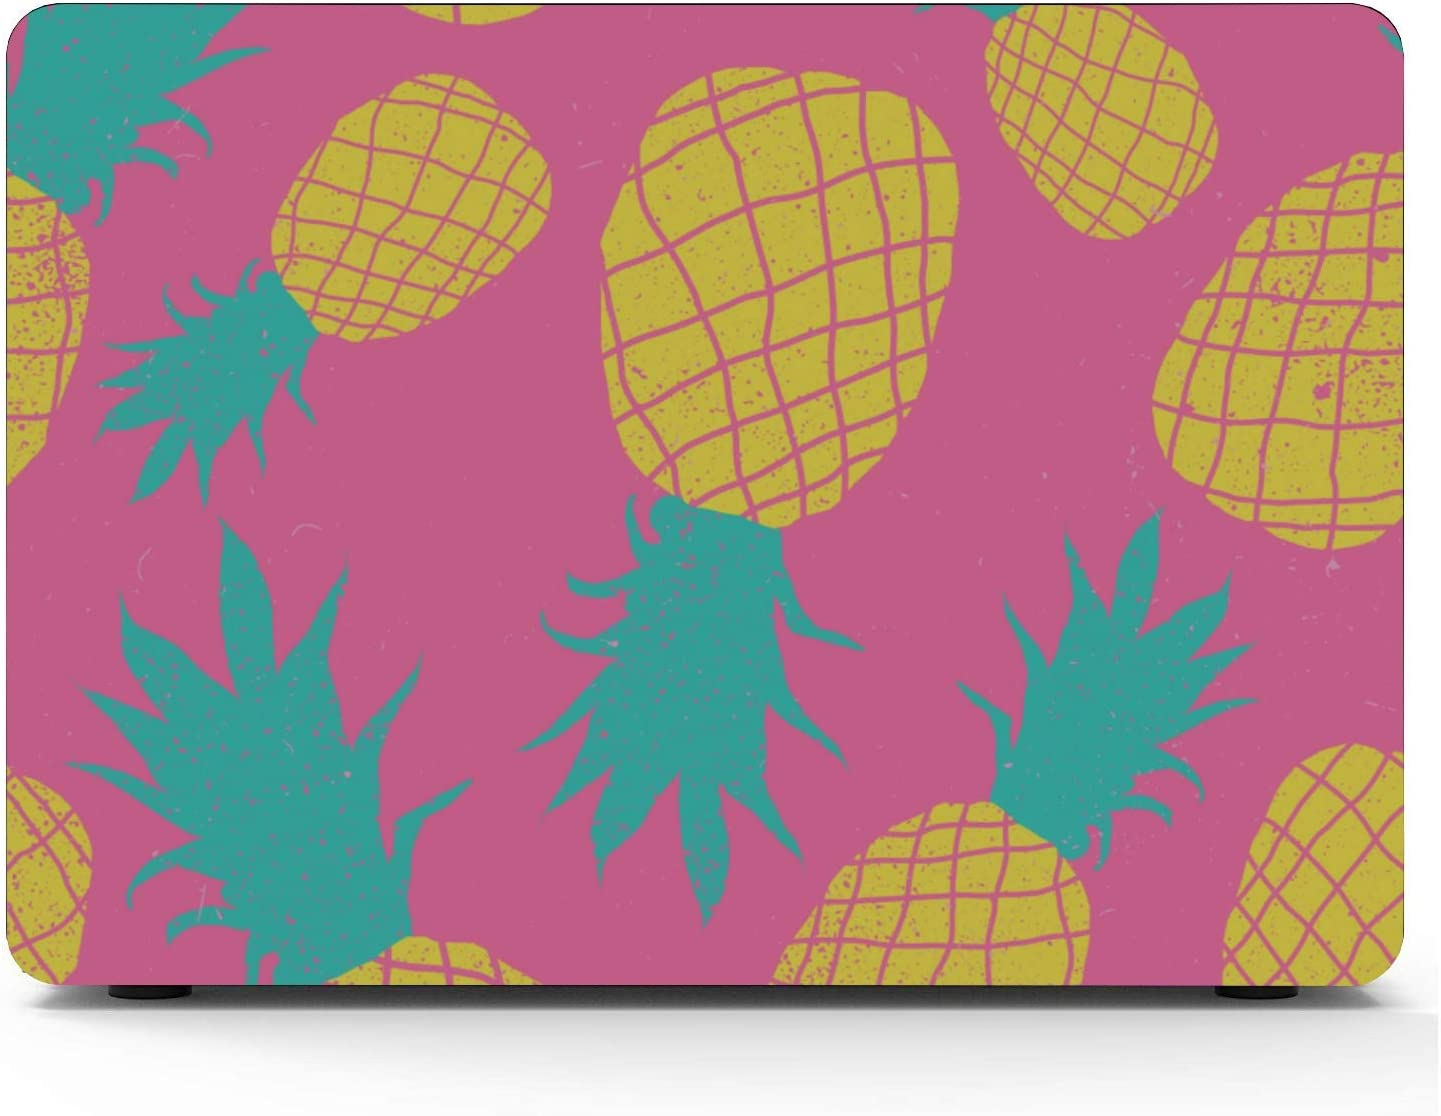 MacBook Pro 2018 Accessories Summer Fashion Cute Fruit Pineapple Plastic Hard Shell Compatible Mac Air 11 Pro 13 15 A1707 MacBook Pro Case Protection for MacBook 2016-2019 Version